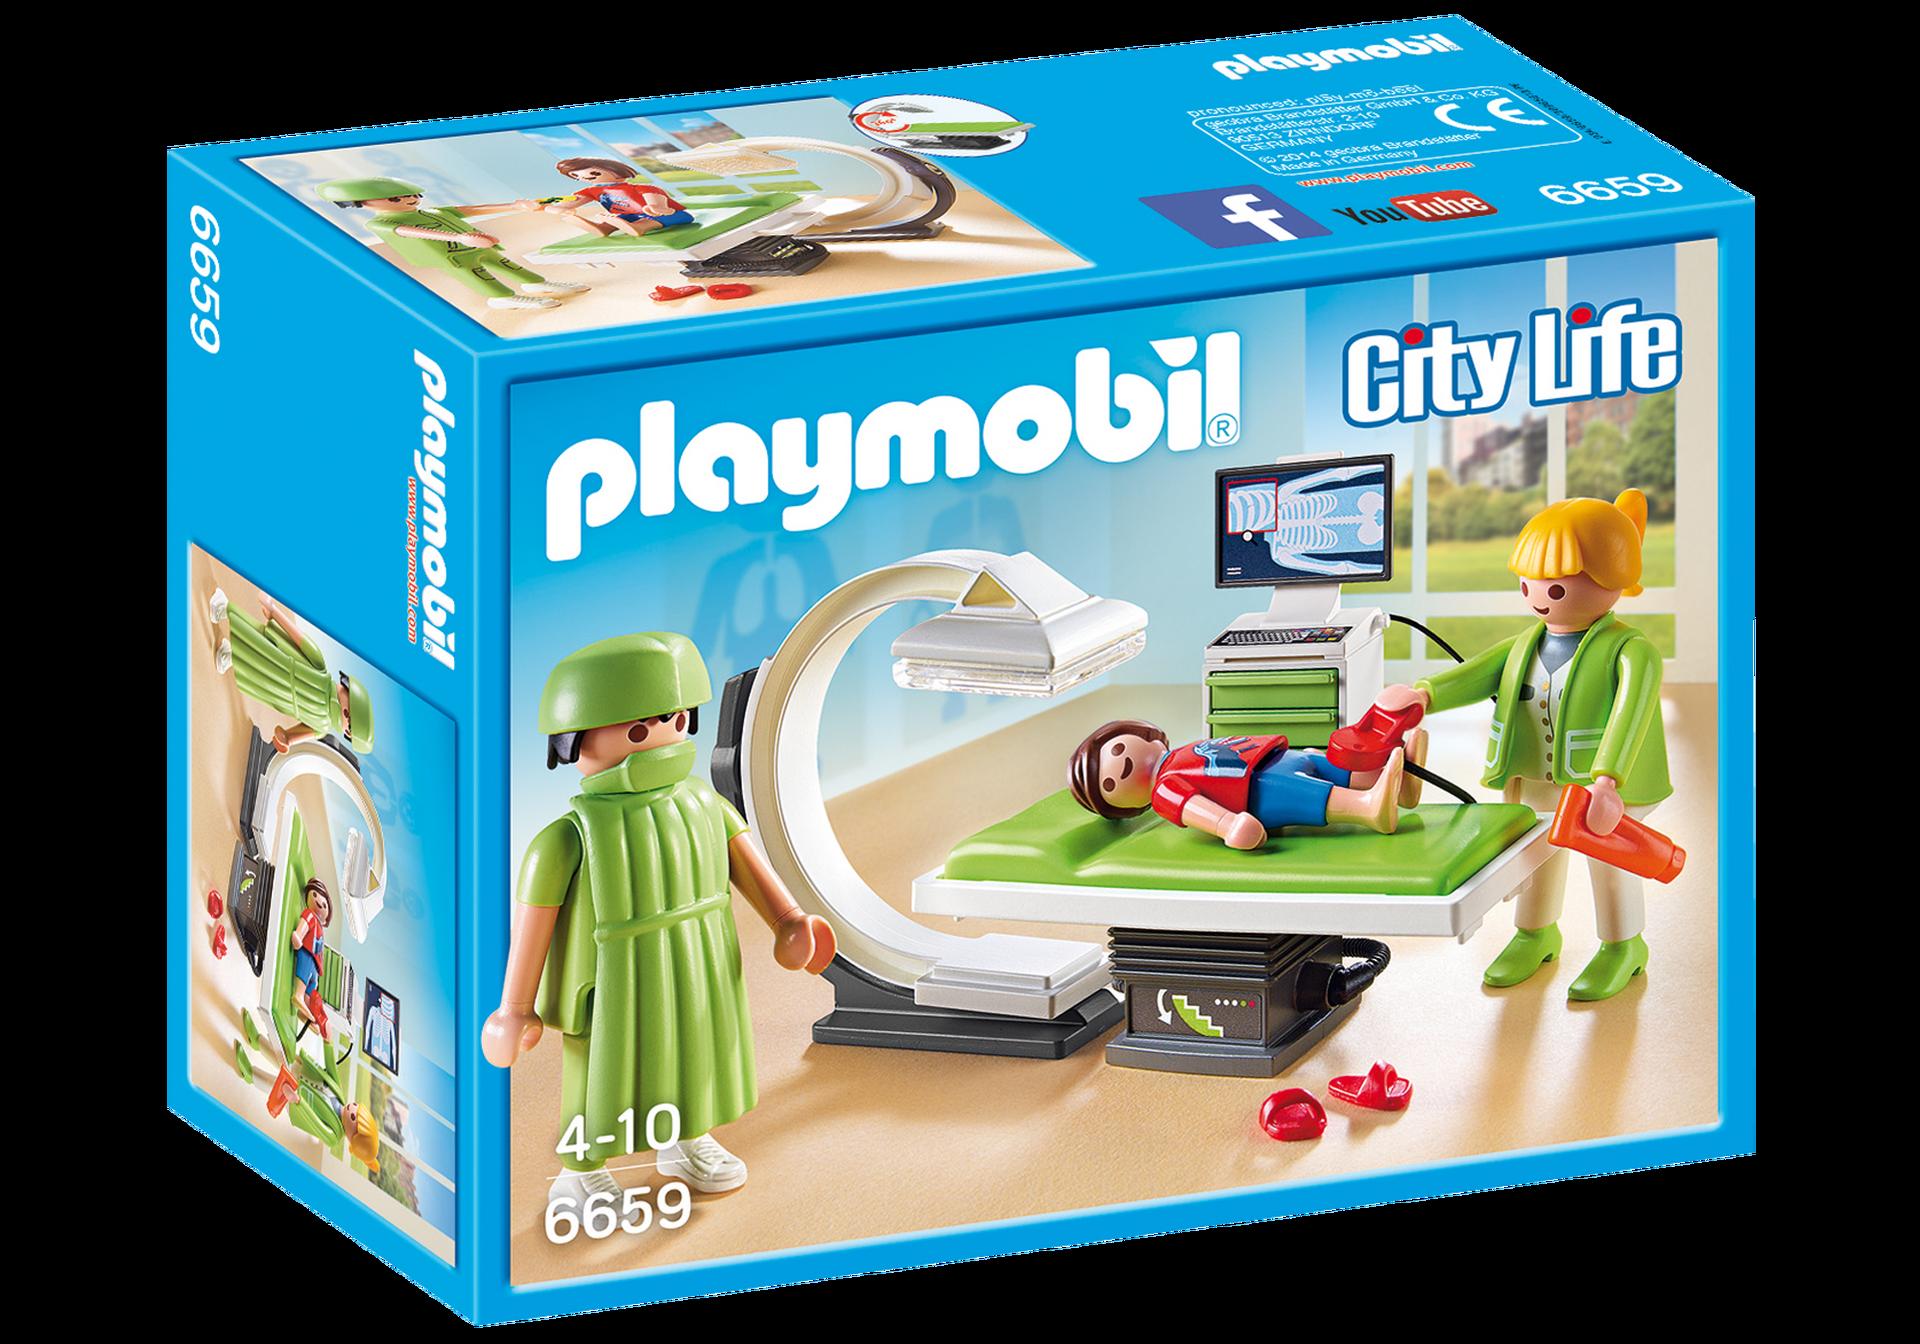 Salle de radiologie 6659 playmobil france for Salle de sejour playmobil